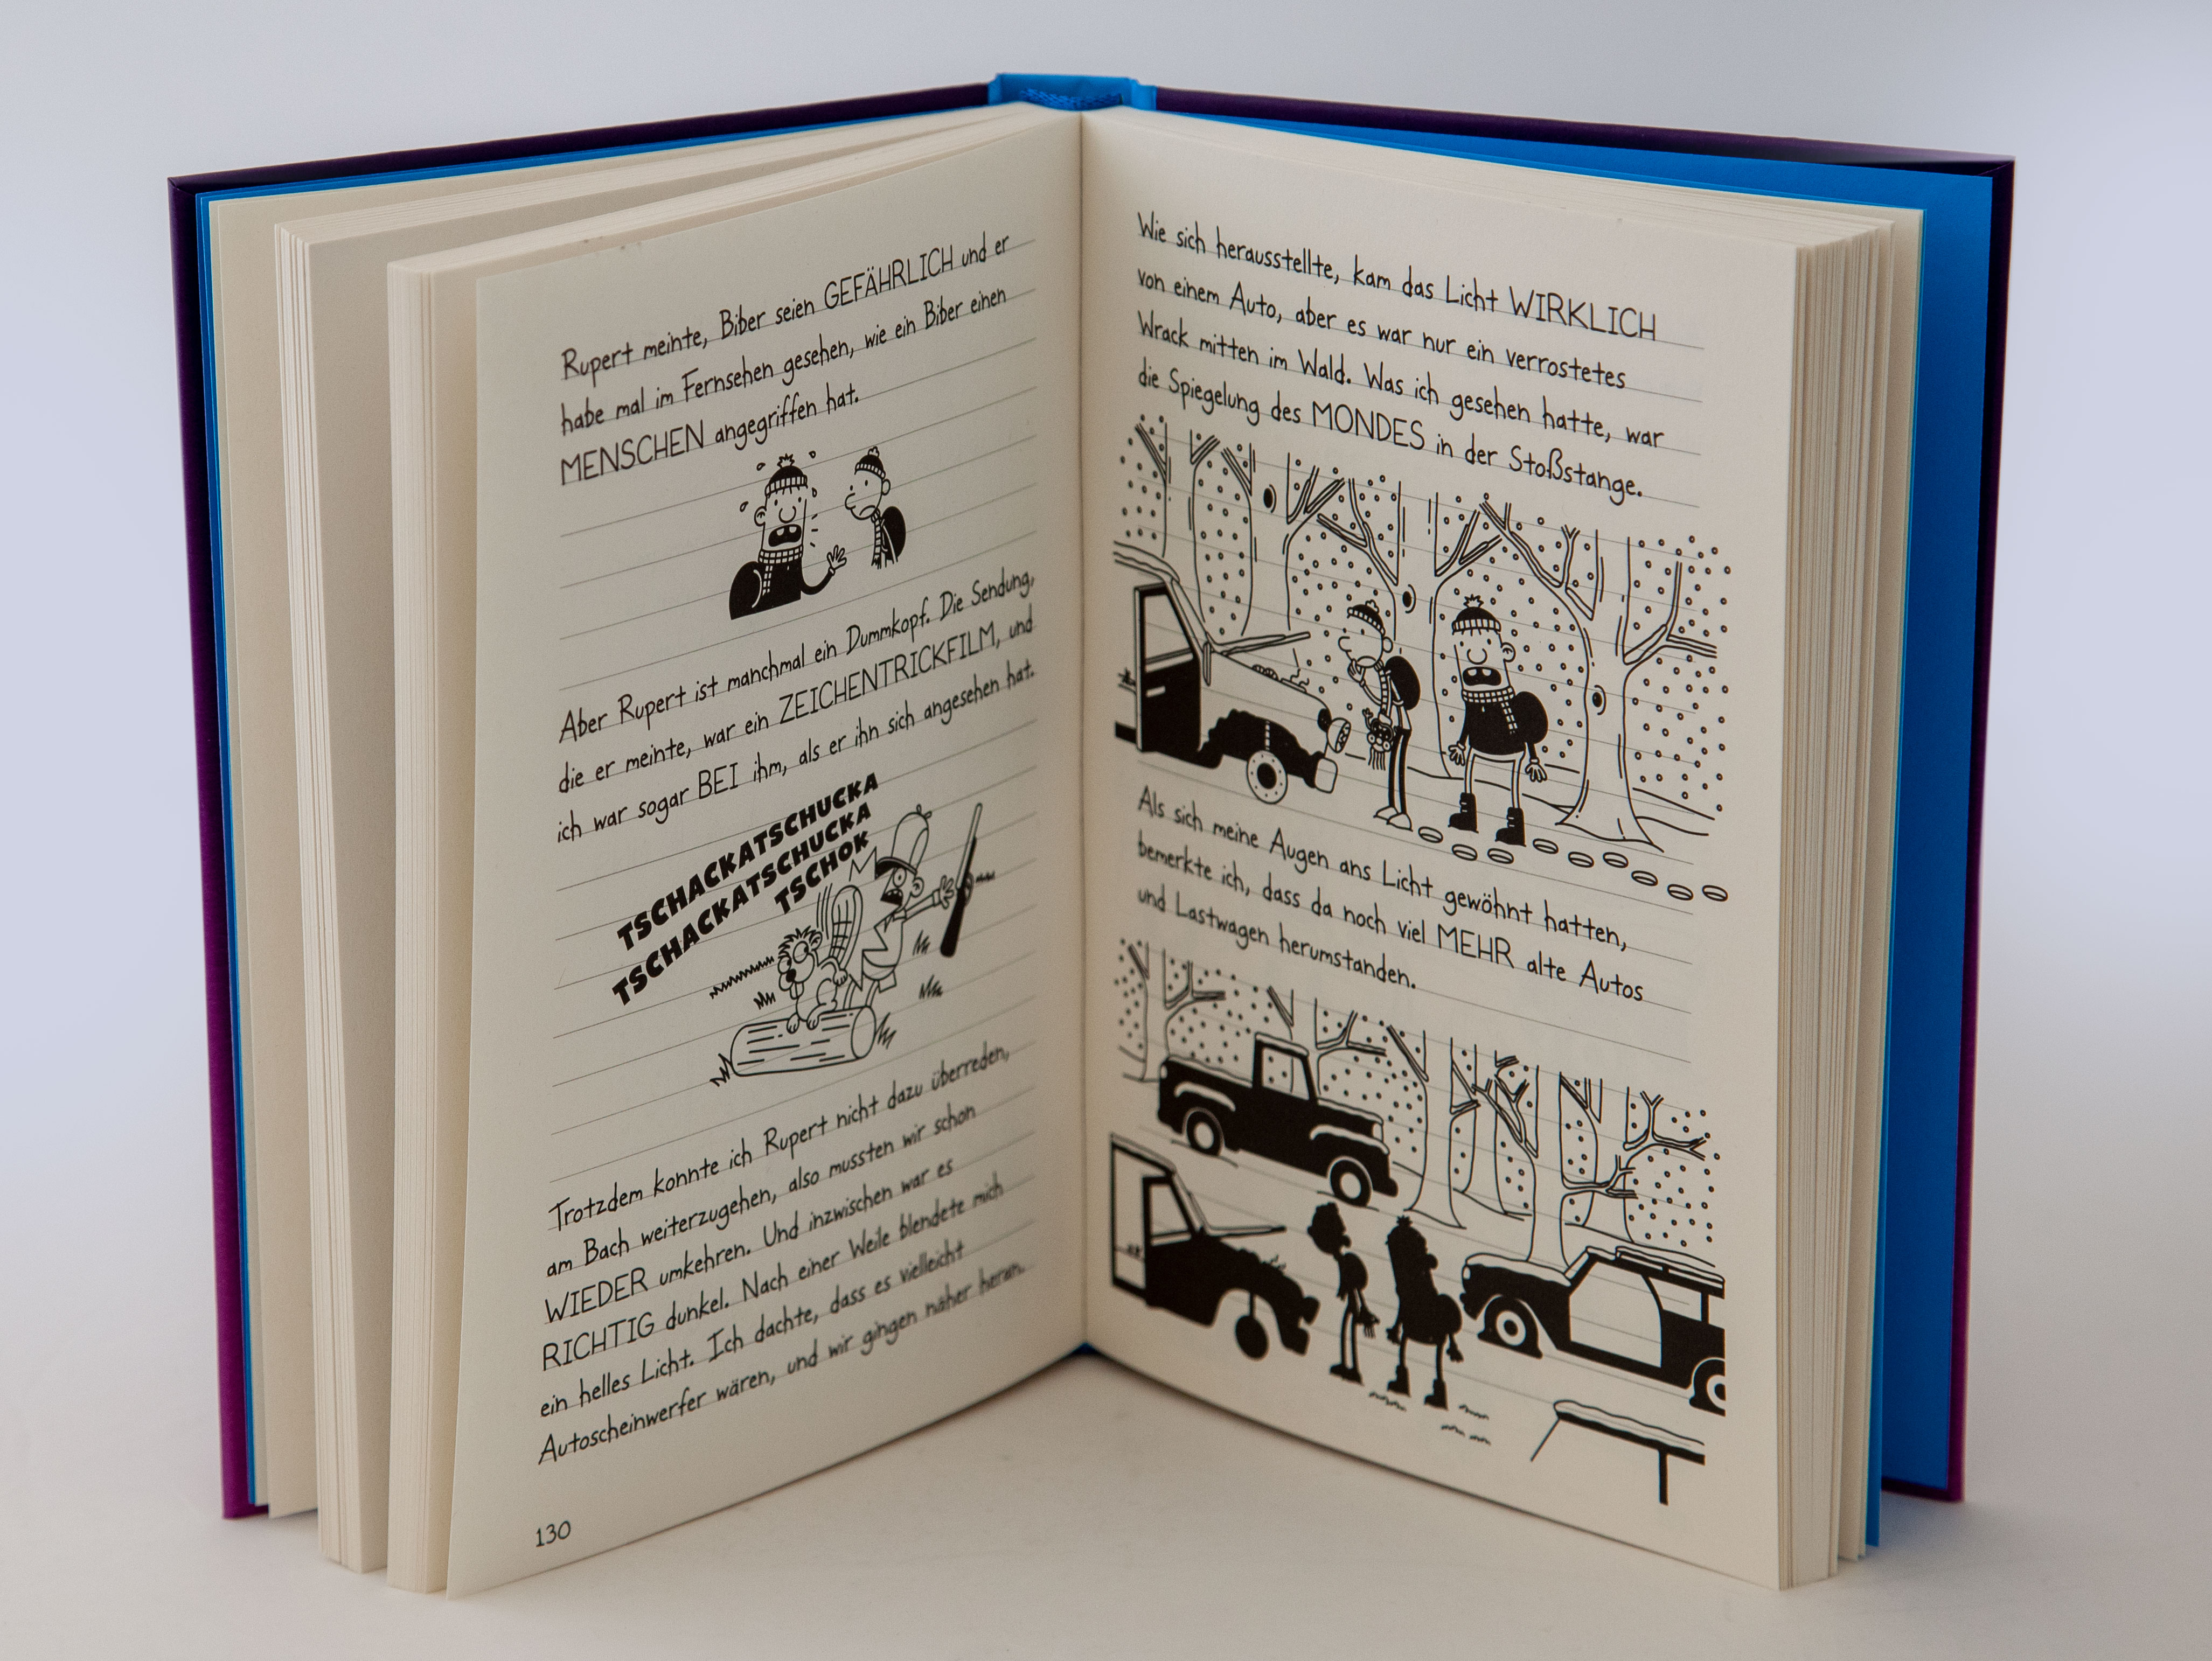 Kostenlos pdf gregs tagebuch